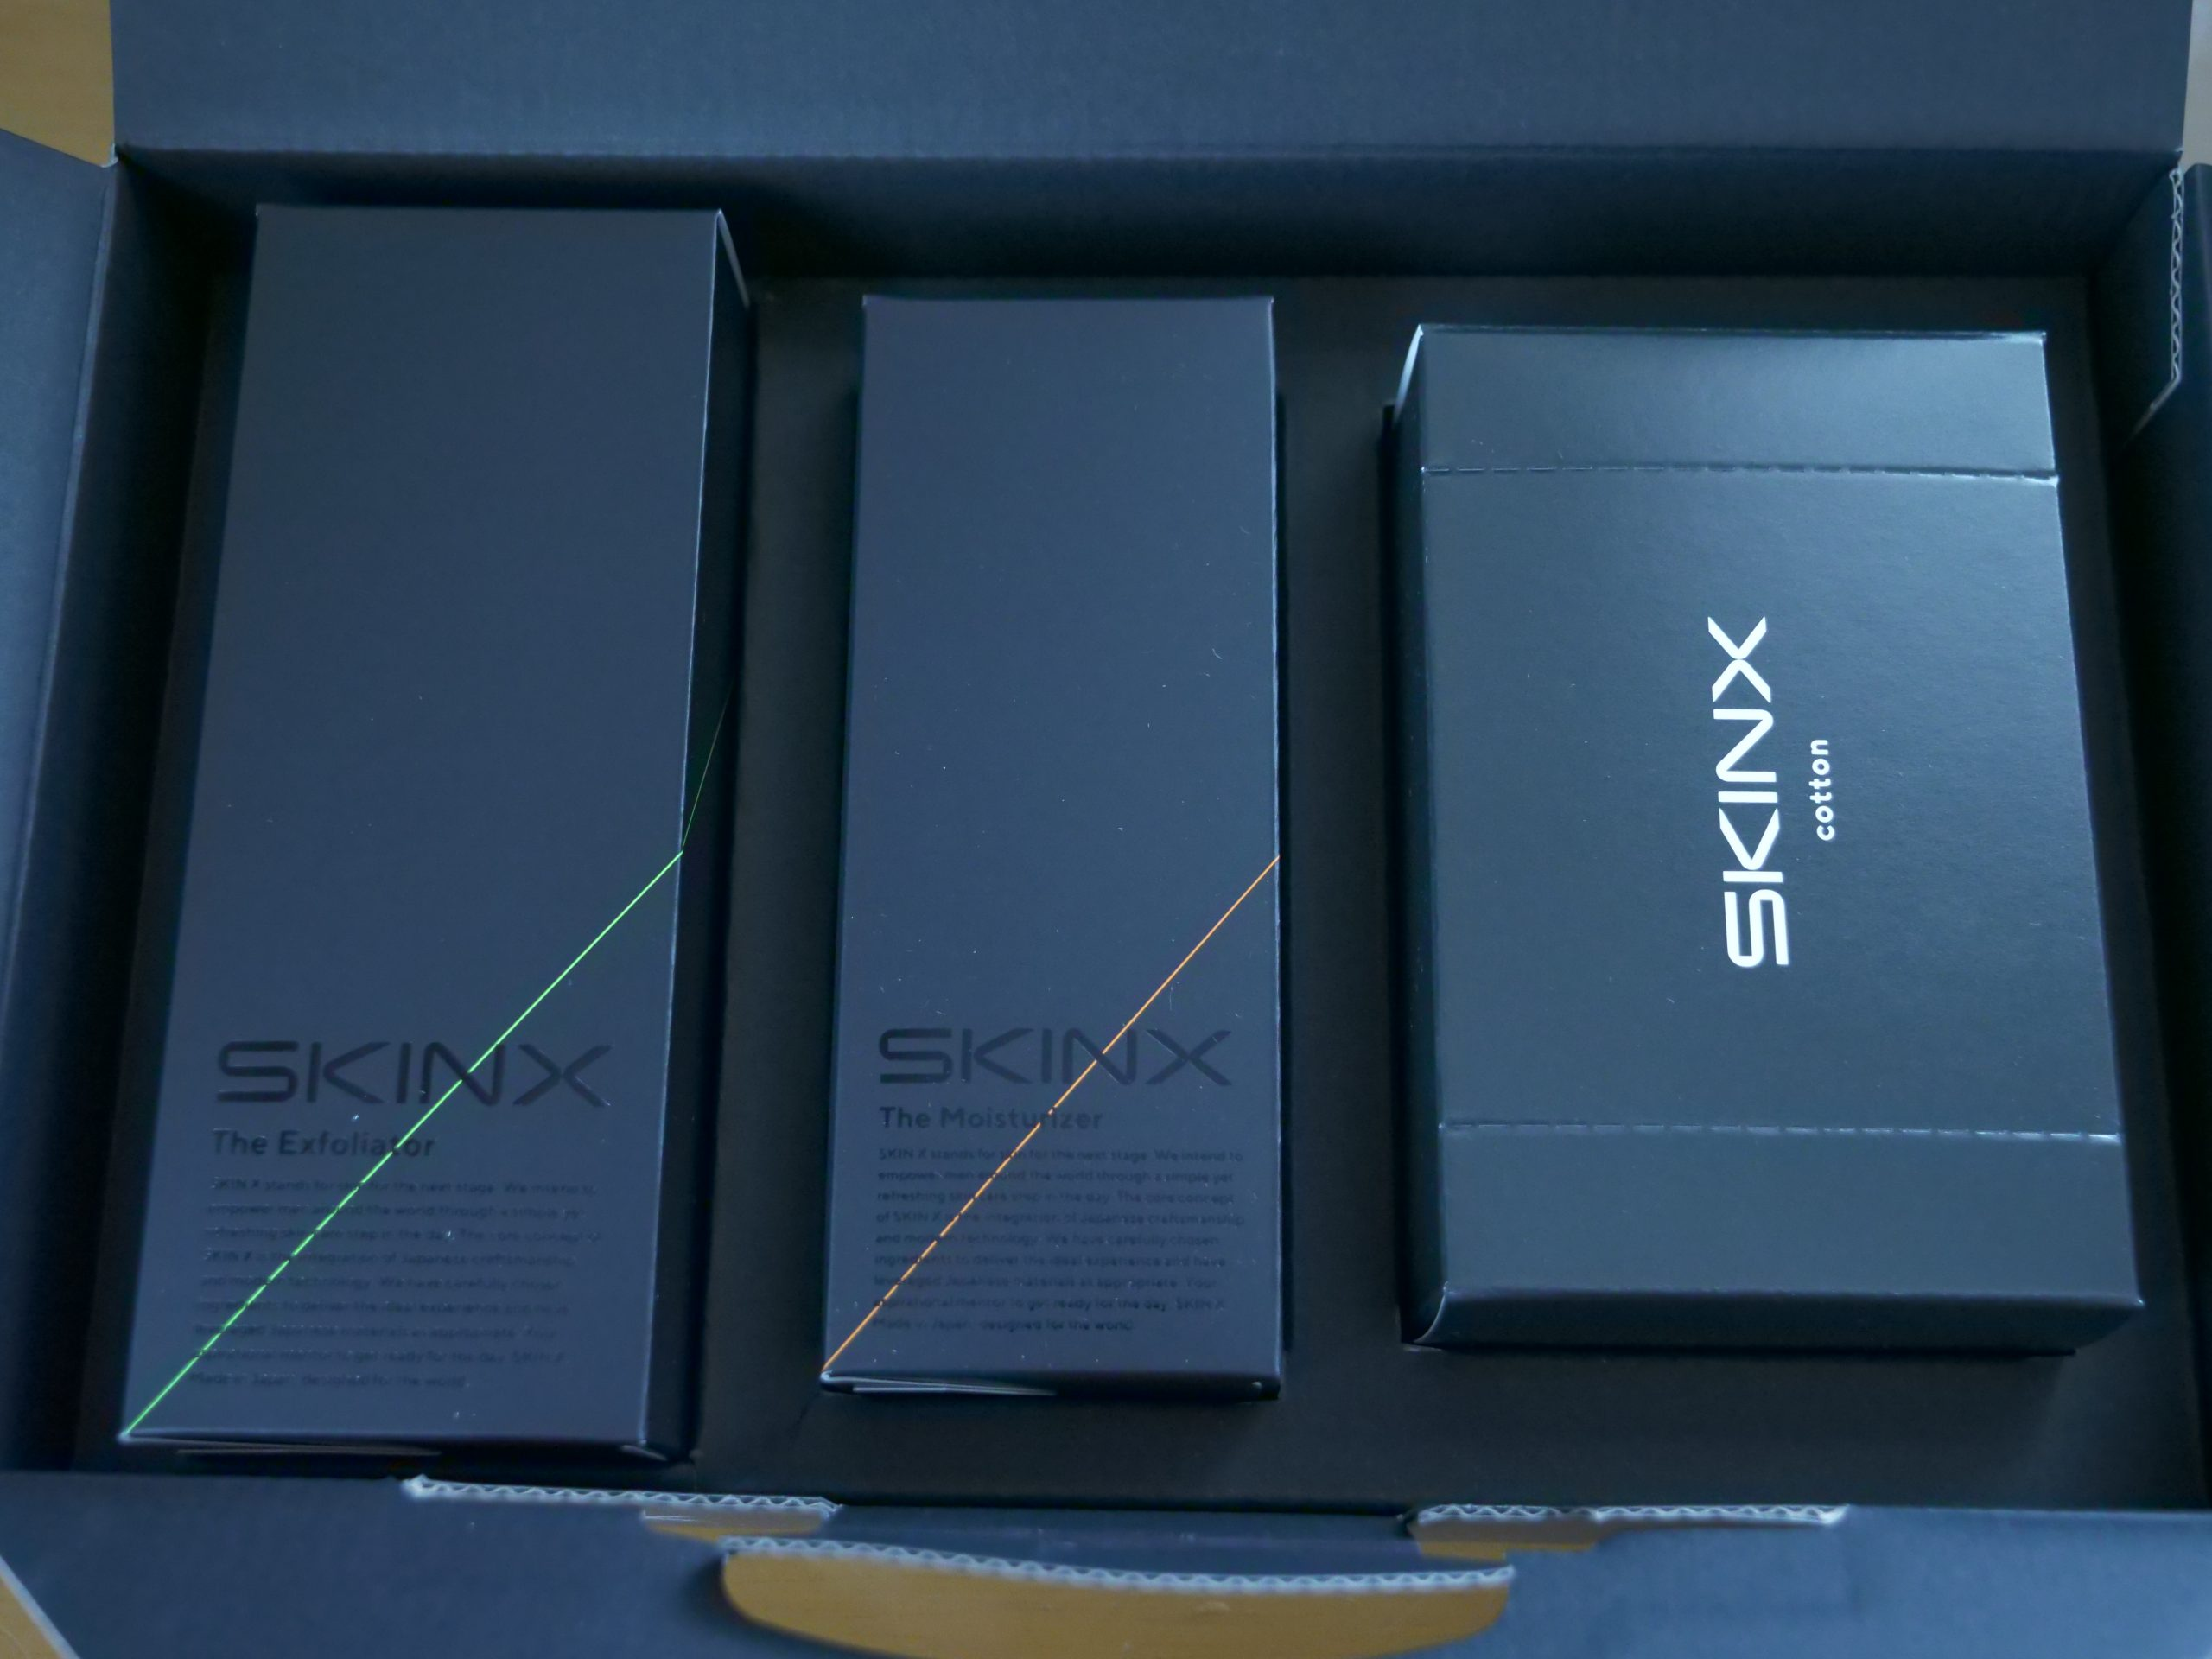 SKINX_箱